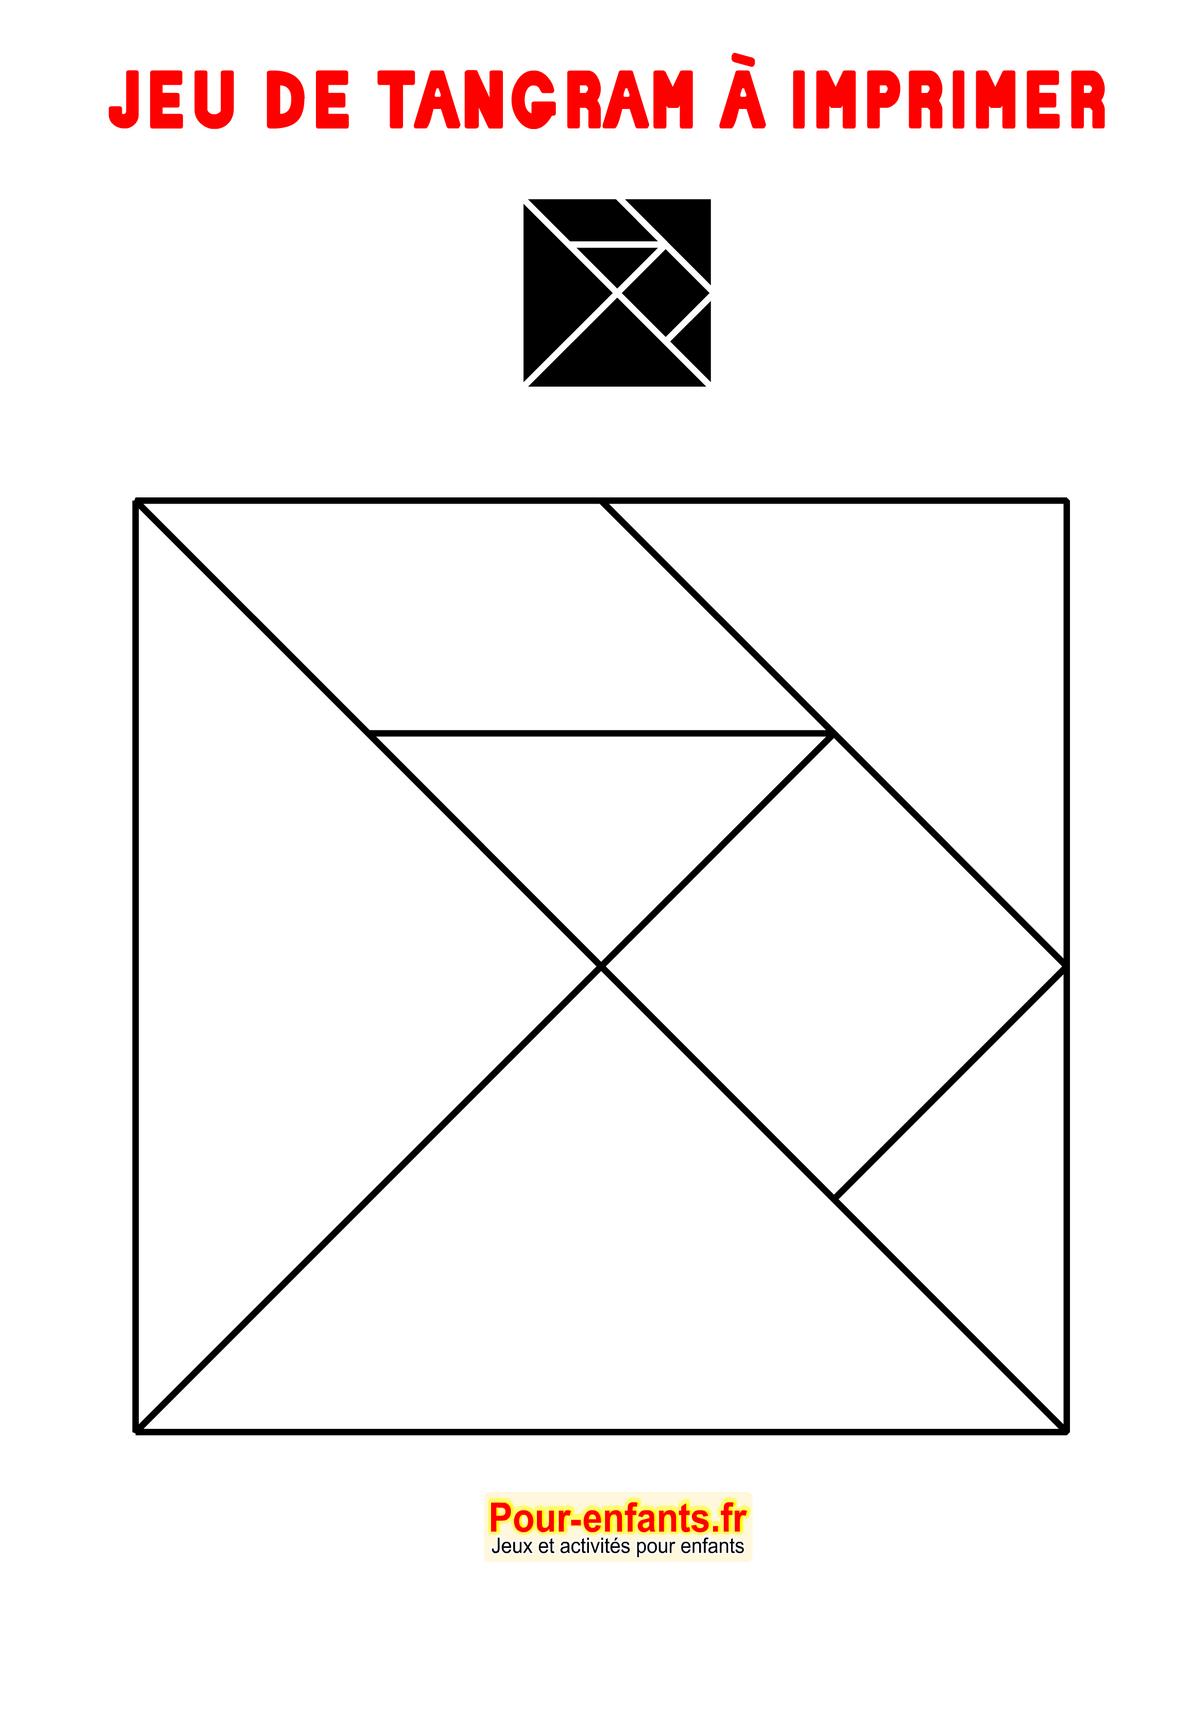 Tangram À Imprimer Maternelle Gratuit Jeux Tangrams tout Tangram Moyenne Section